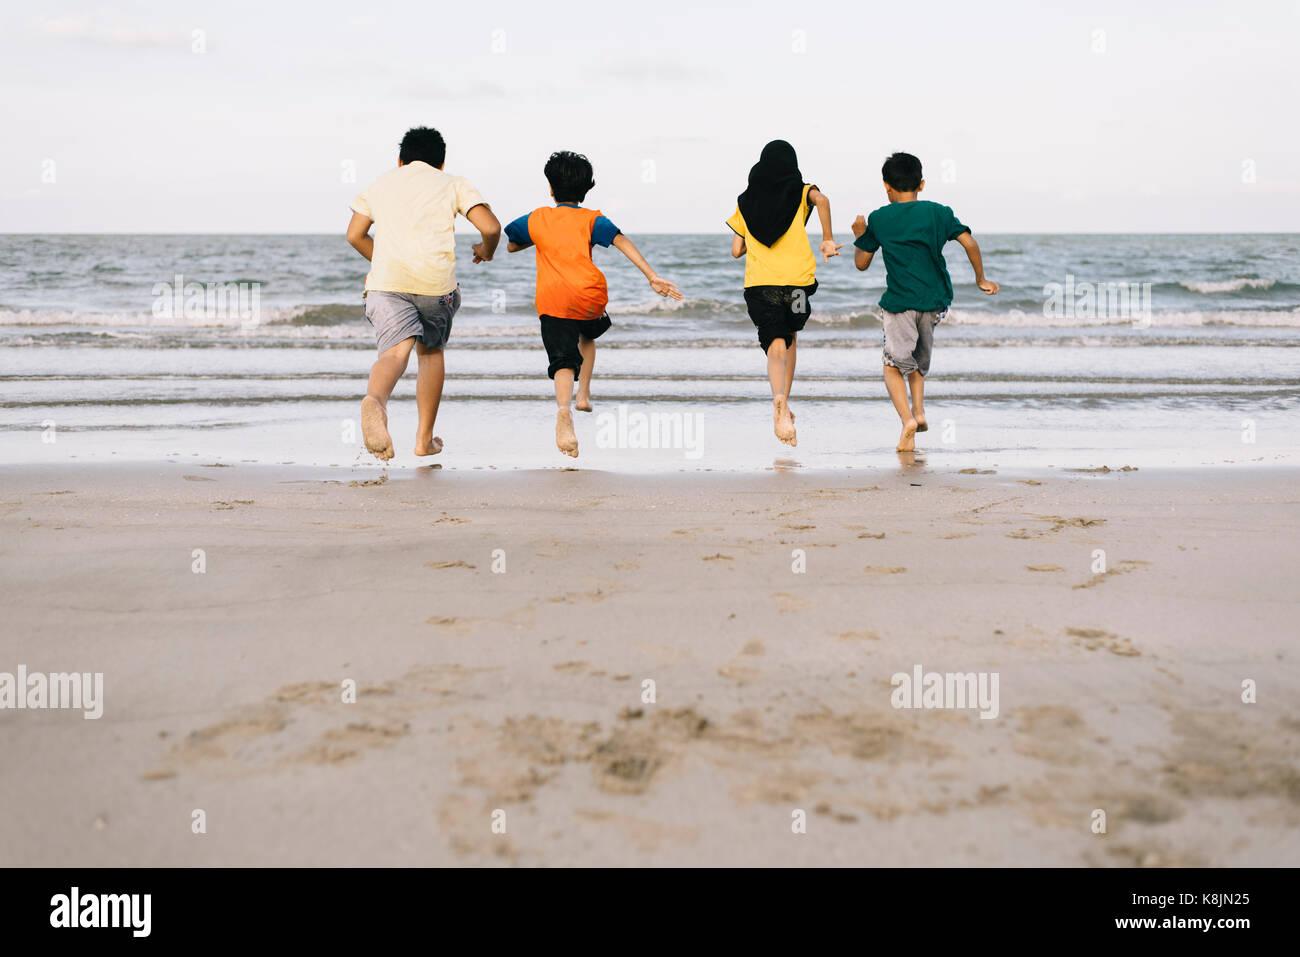 Kinder am Strand zusammen. Freundschaft Konzept. Familie Ferien Konzept Konzept. Stockbild